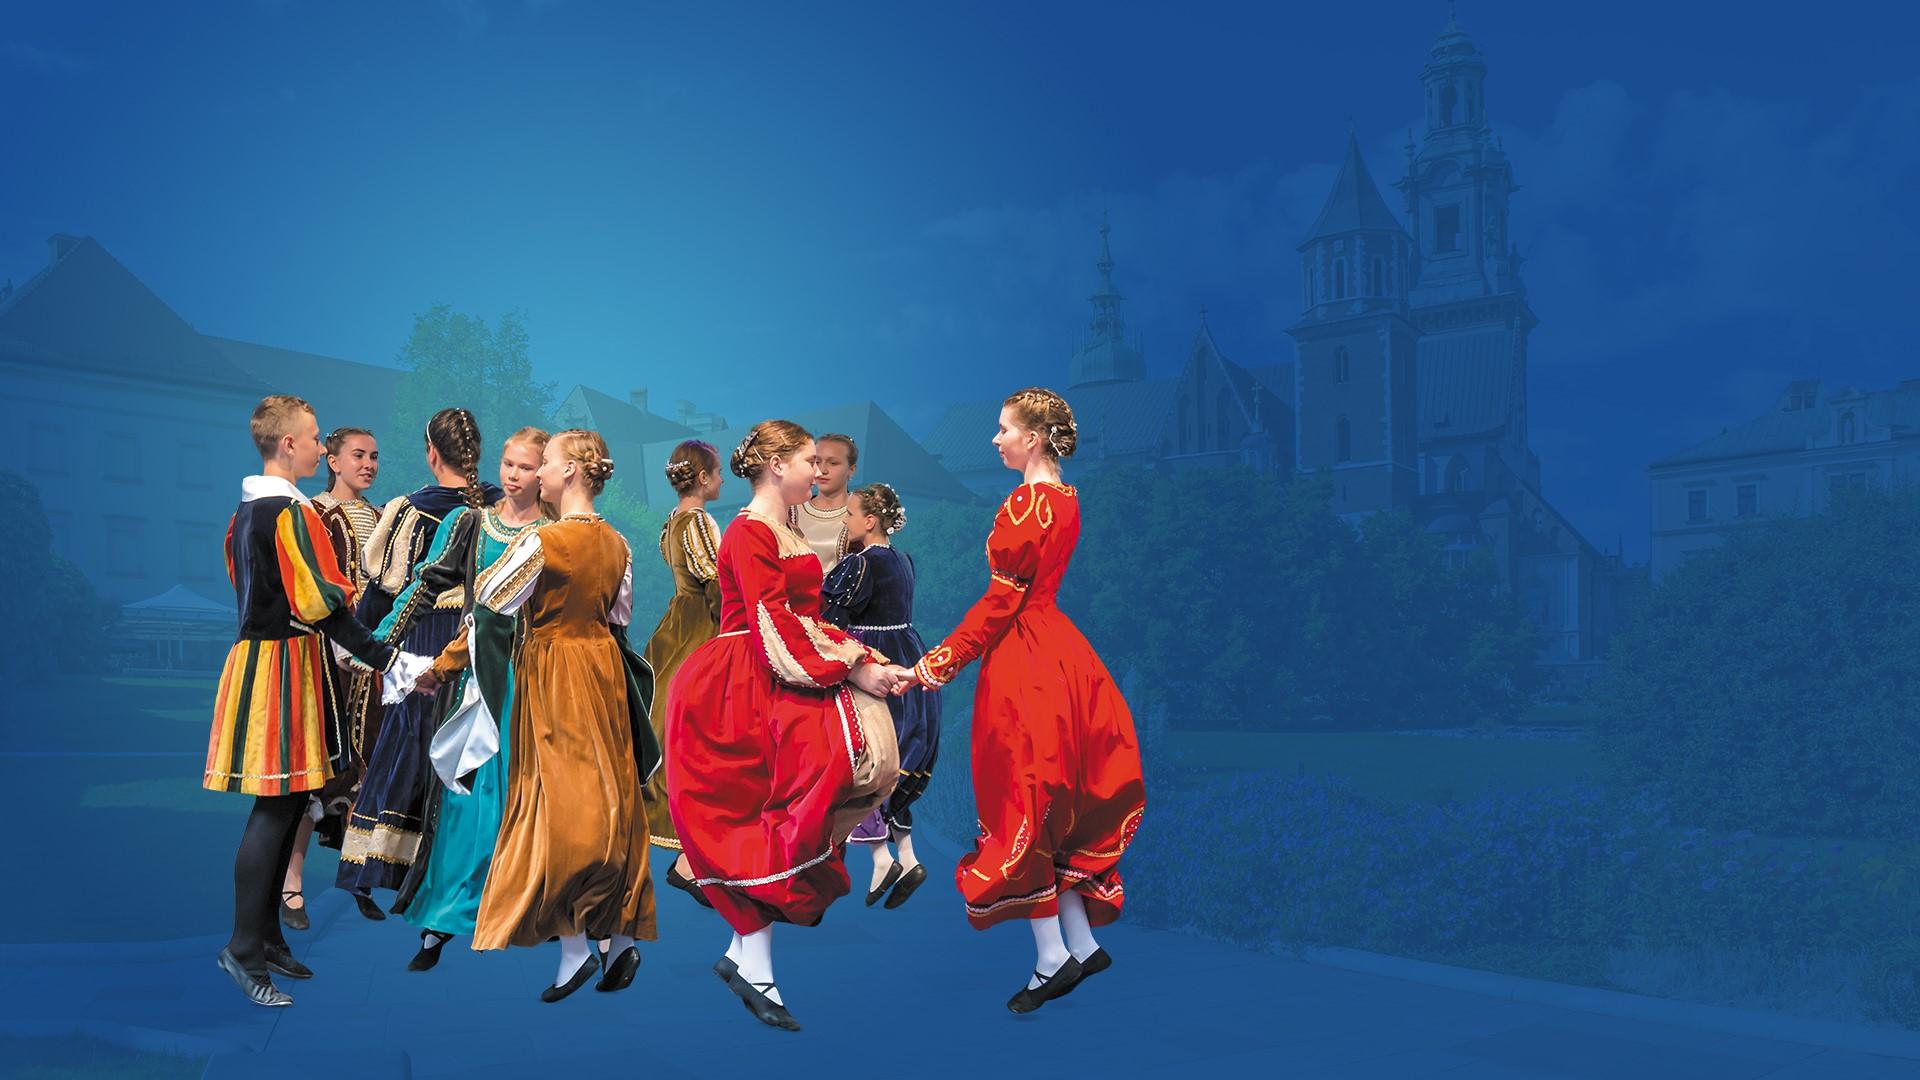 KRAKÓW DANCES AT WAWEL